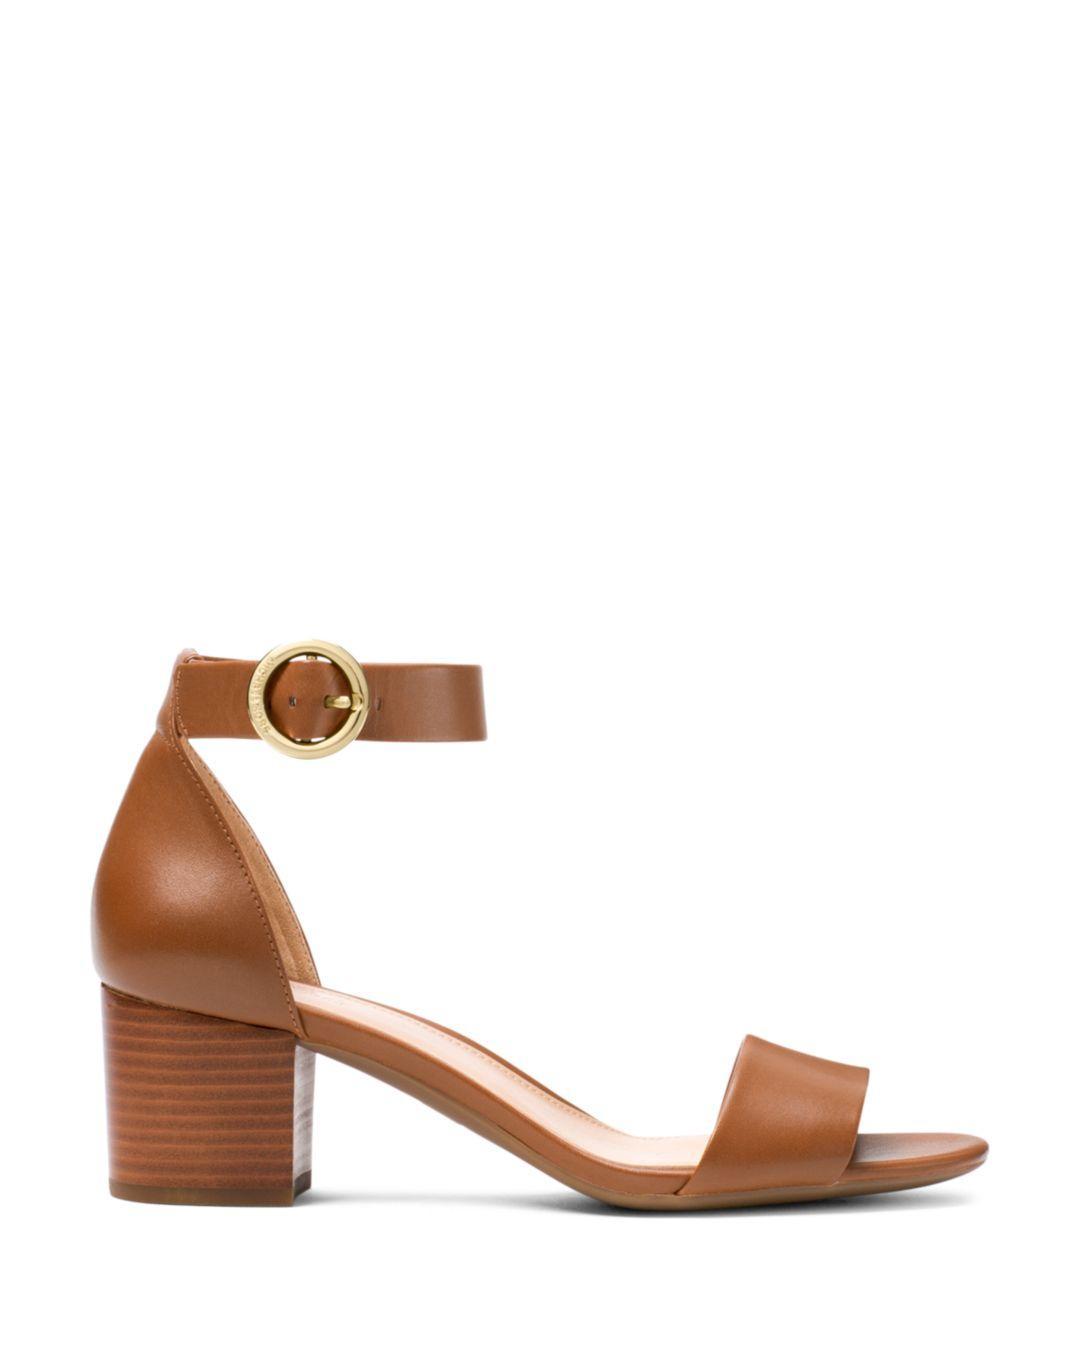 7b88424a07a Lyst - MICHAEL Michael Kors Women s Lena Low Block Heel Sandals in Brown